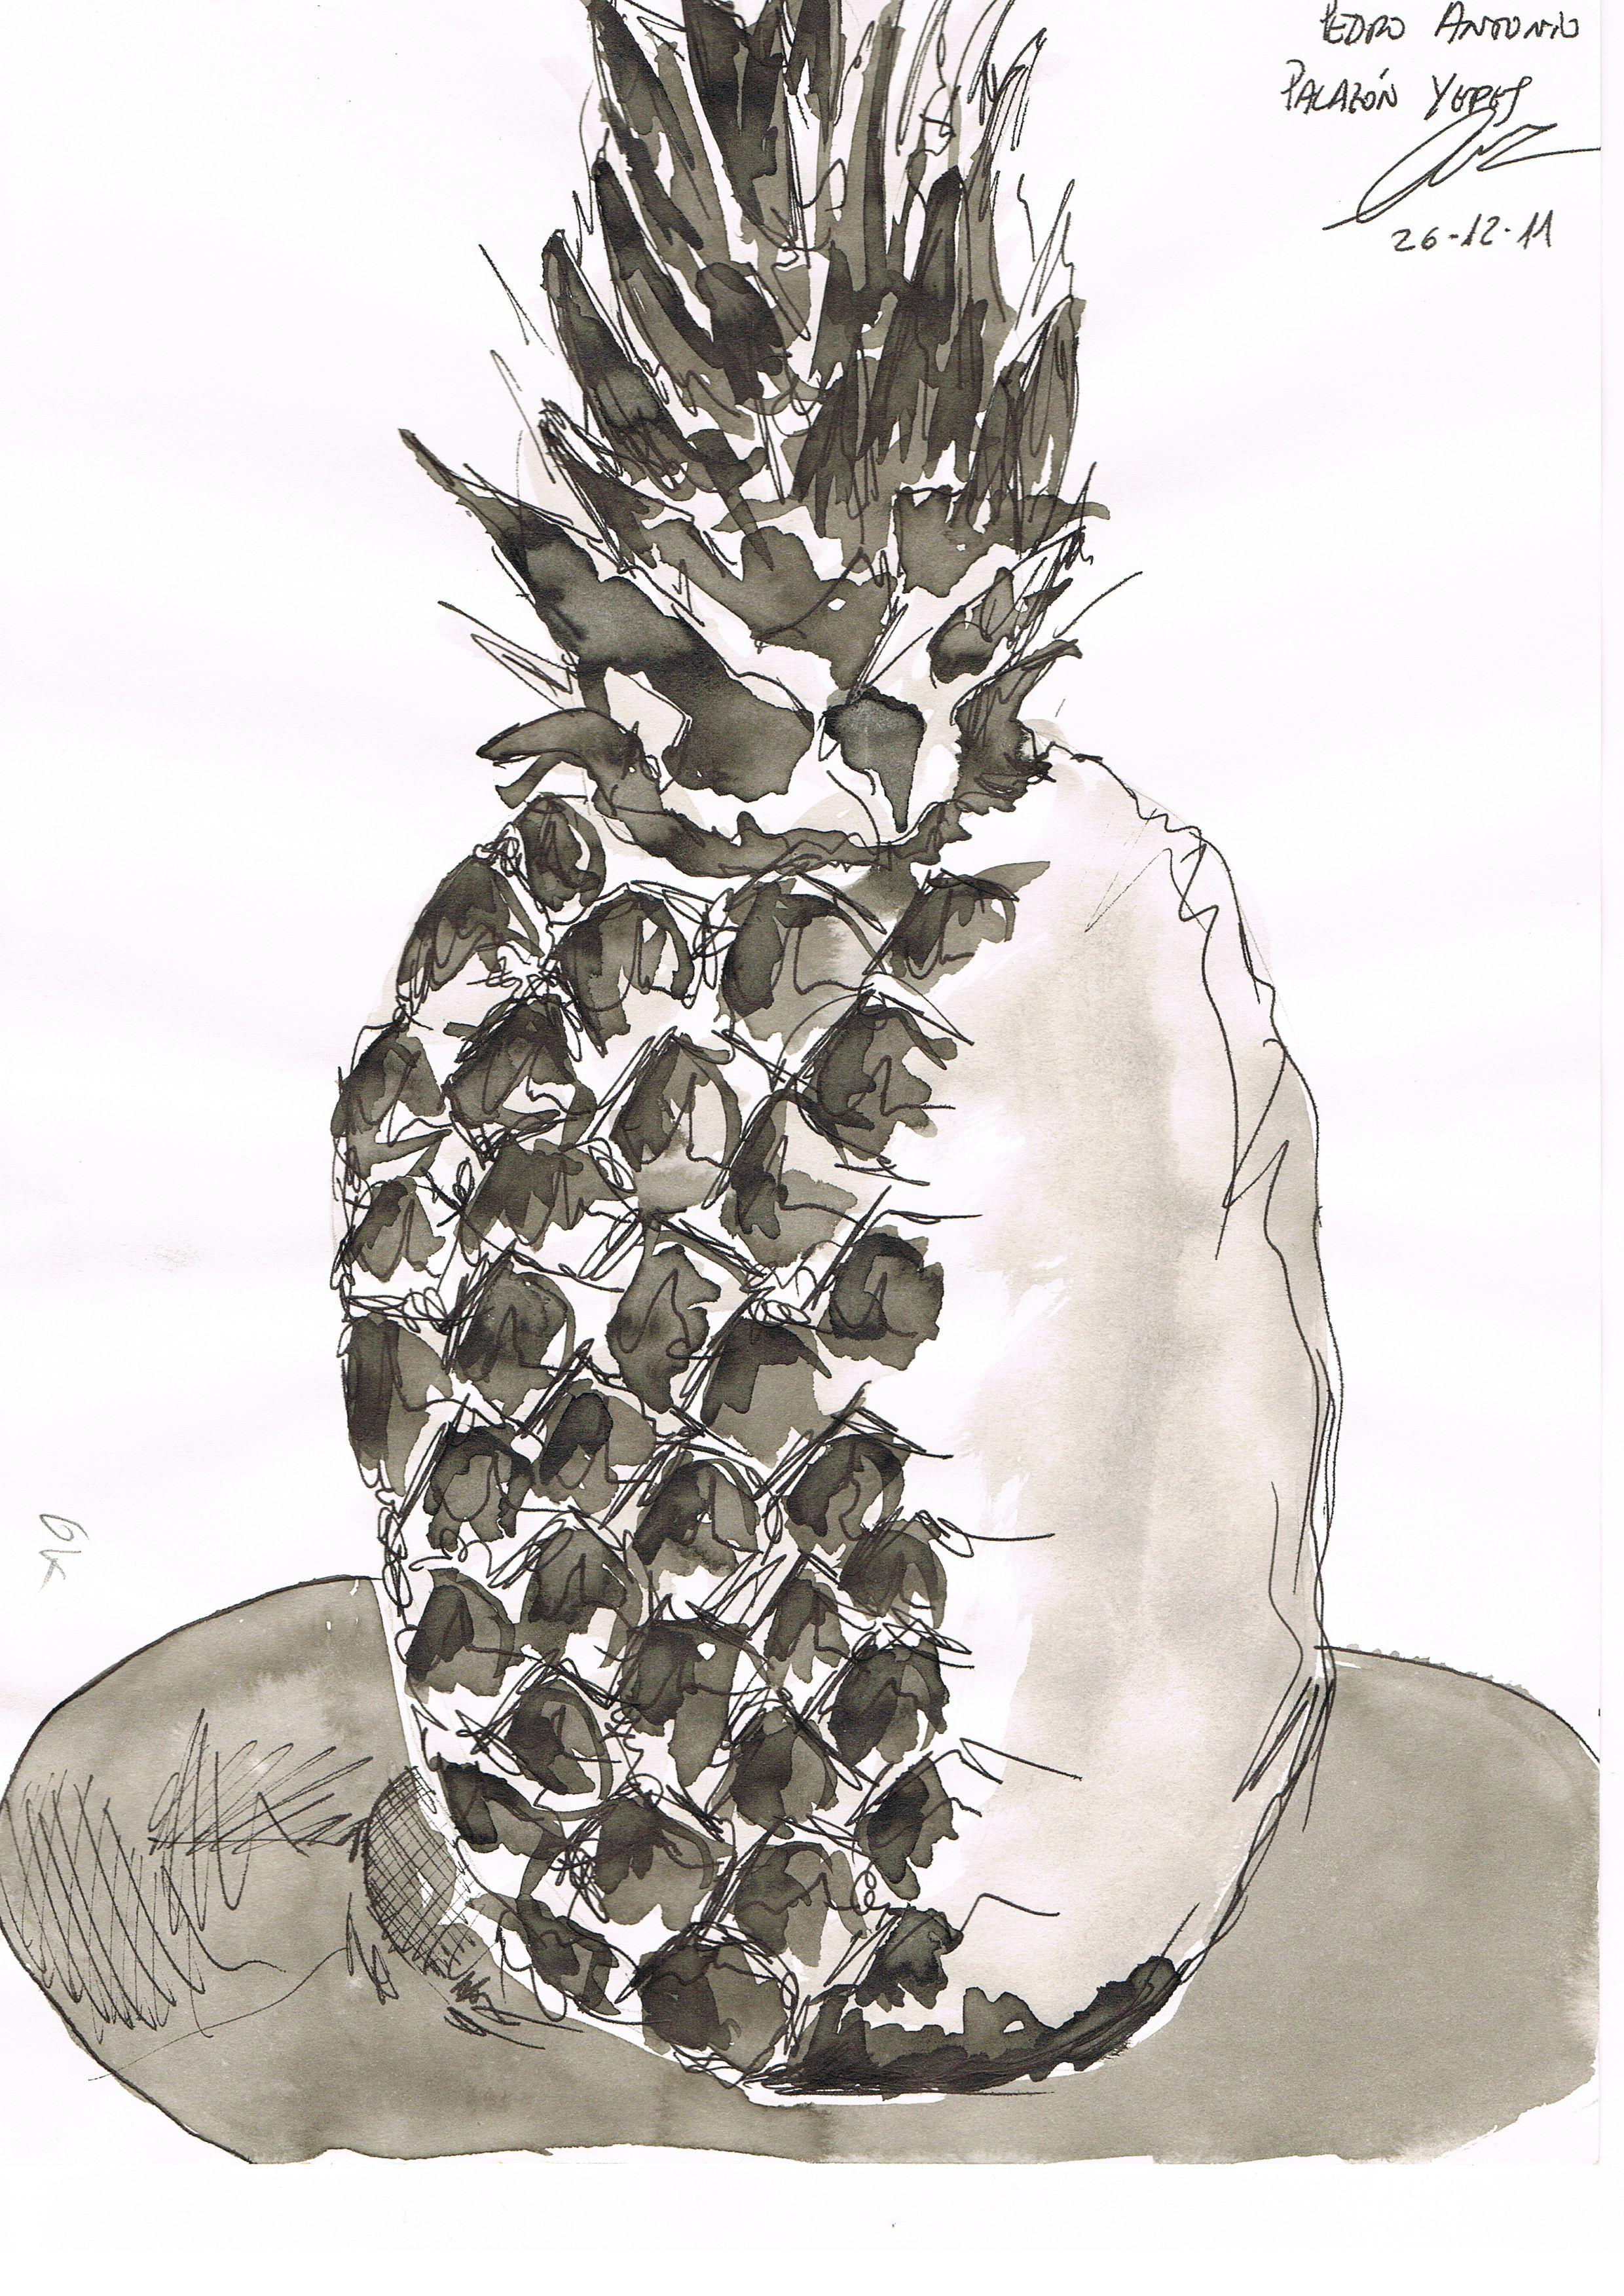 Dibujo Tecnica Mixta Tinta China Aguada Y Tinta Estilografo Autor Pedro Palazon Yepes Tinta China Tinta Estilografo